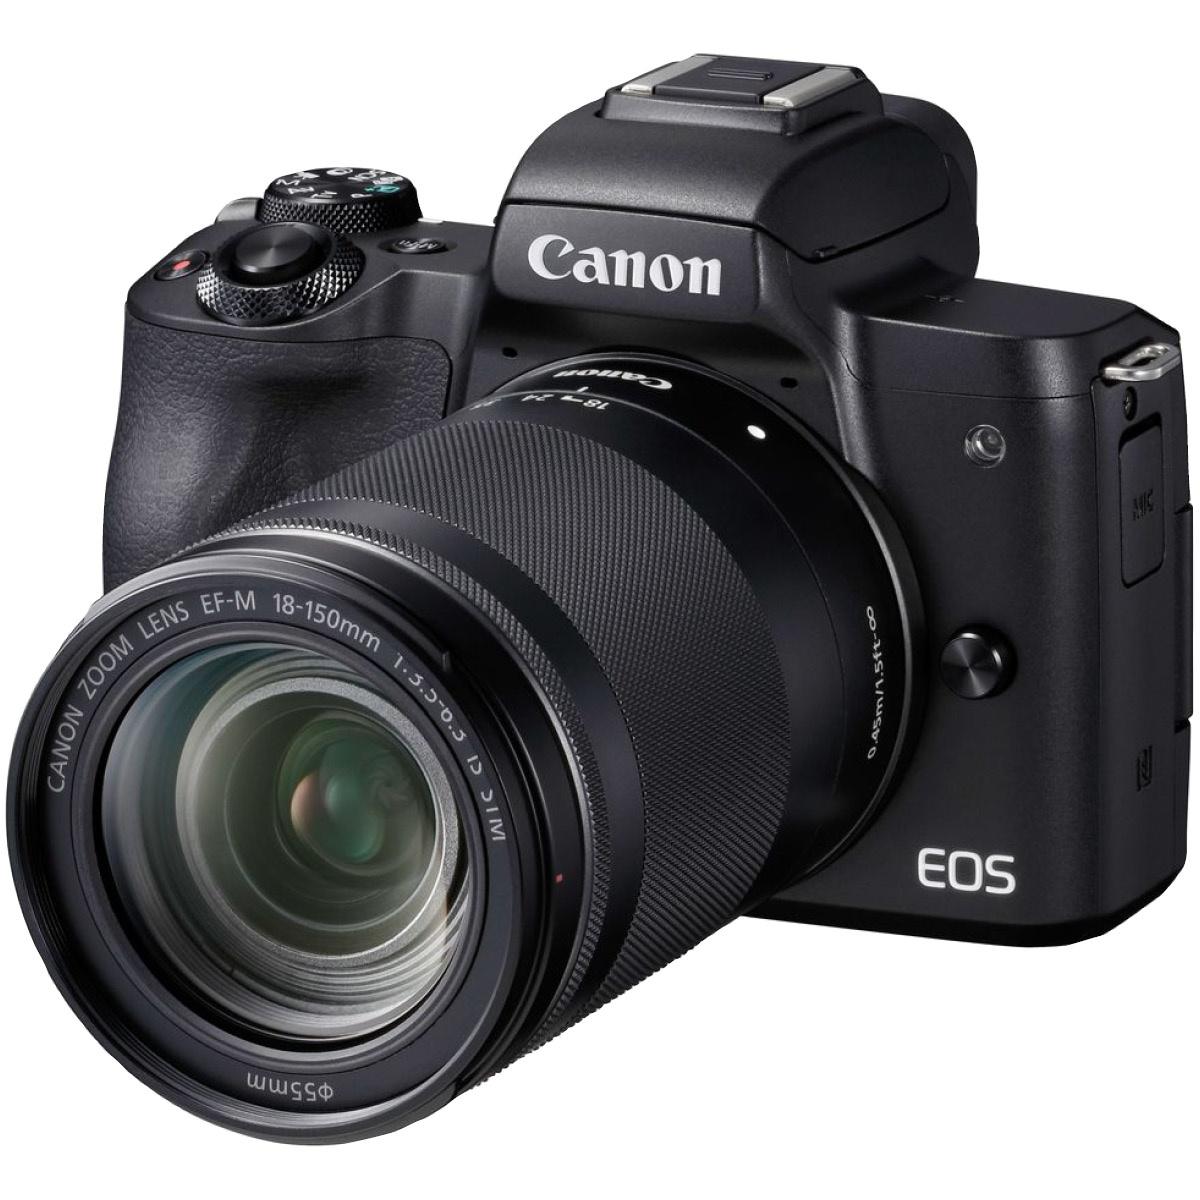 Canon EOS M50 Kit mit 18-150 mm 1:3,5-6,3